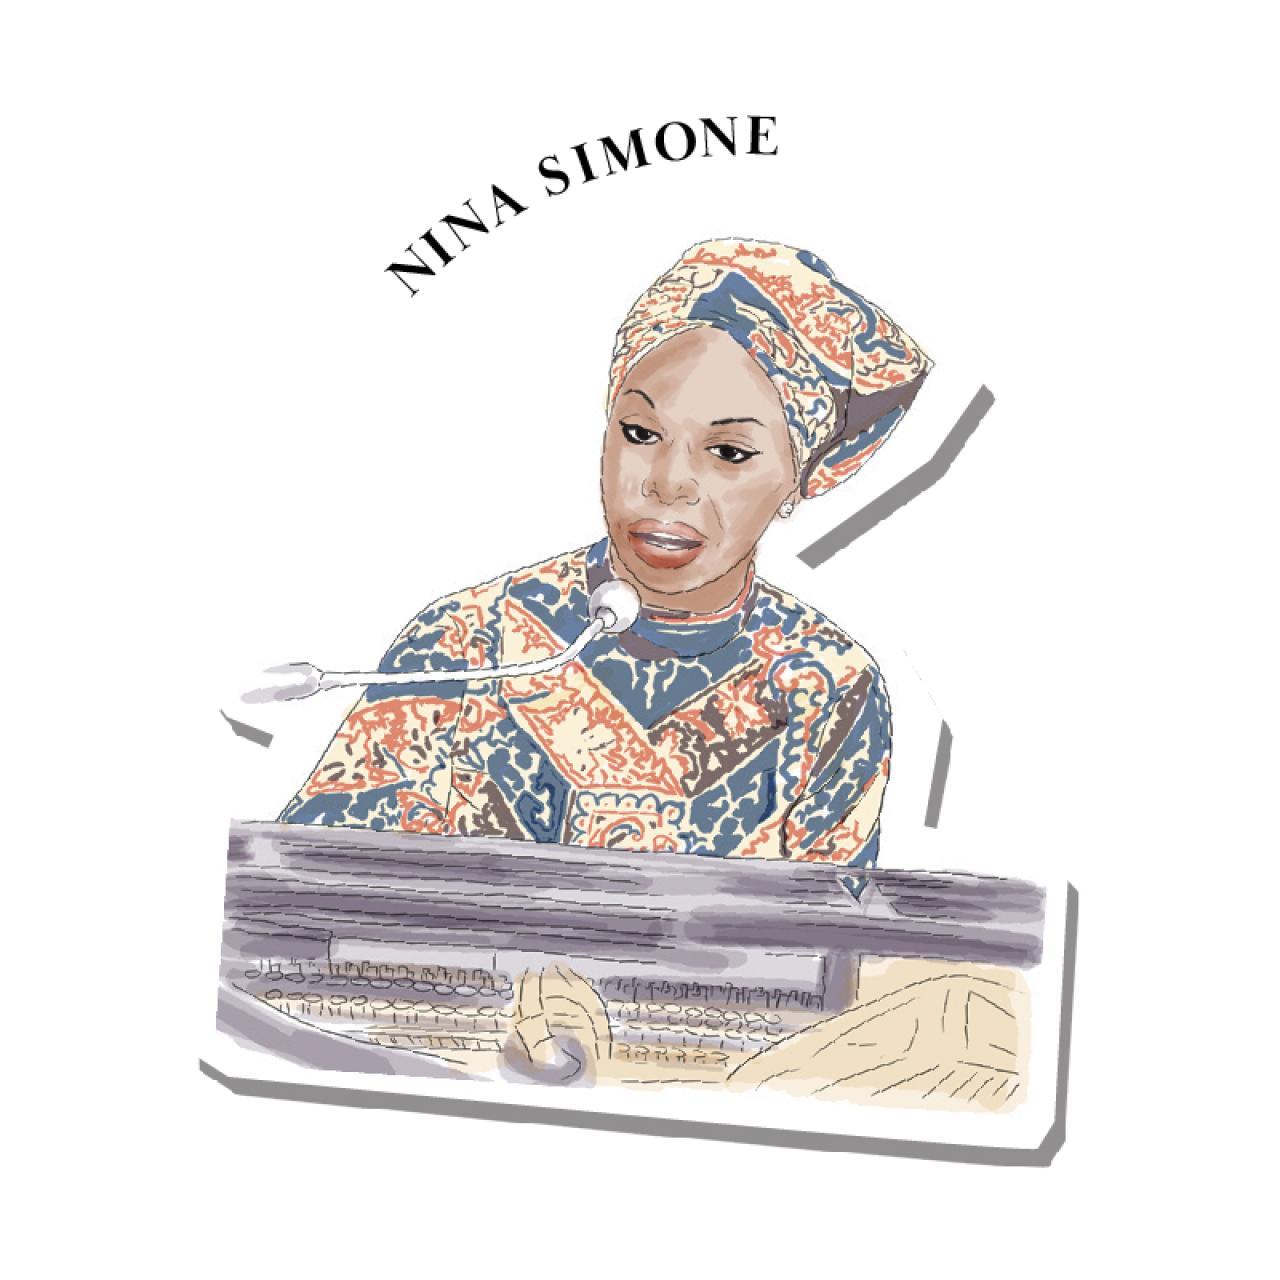 An illustration of Nina Simone